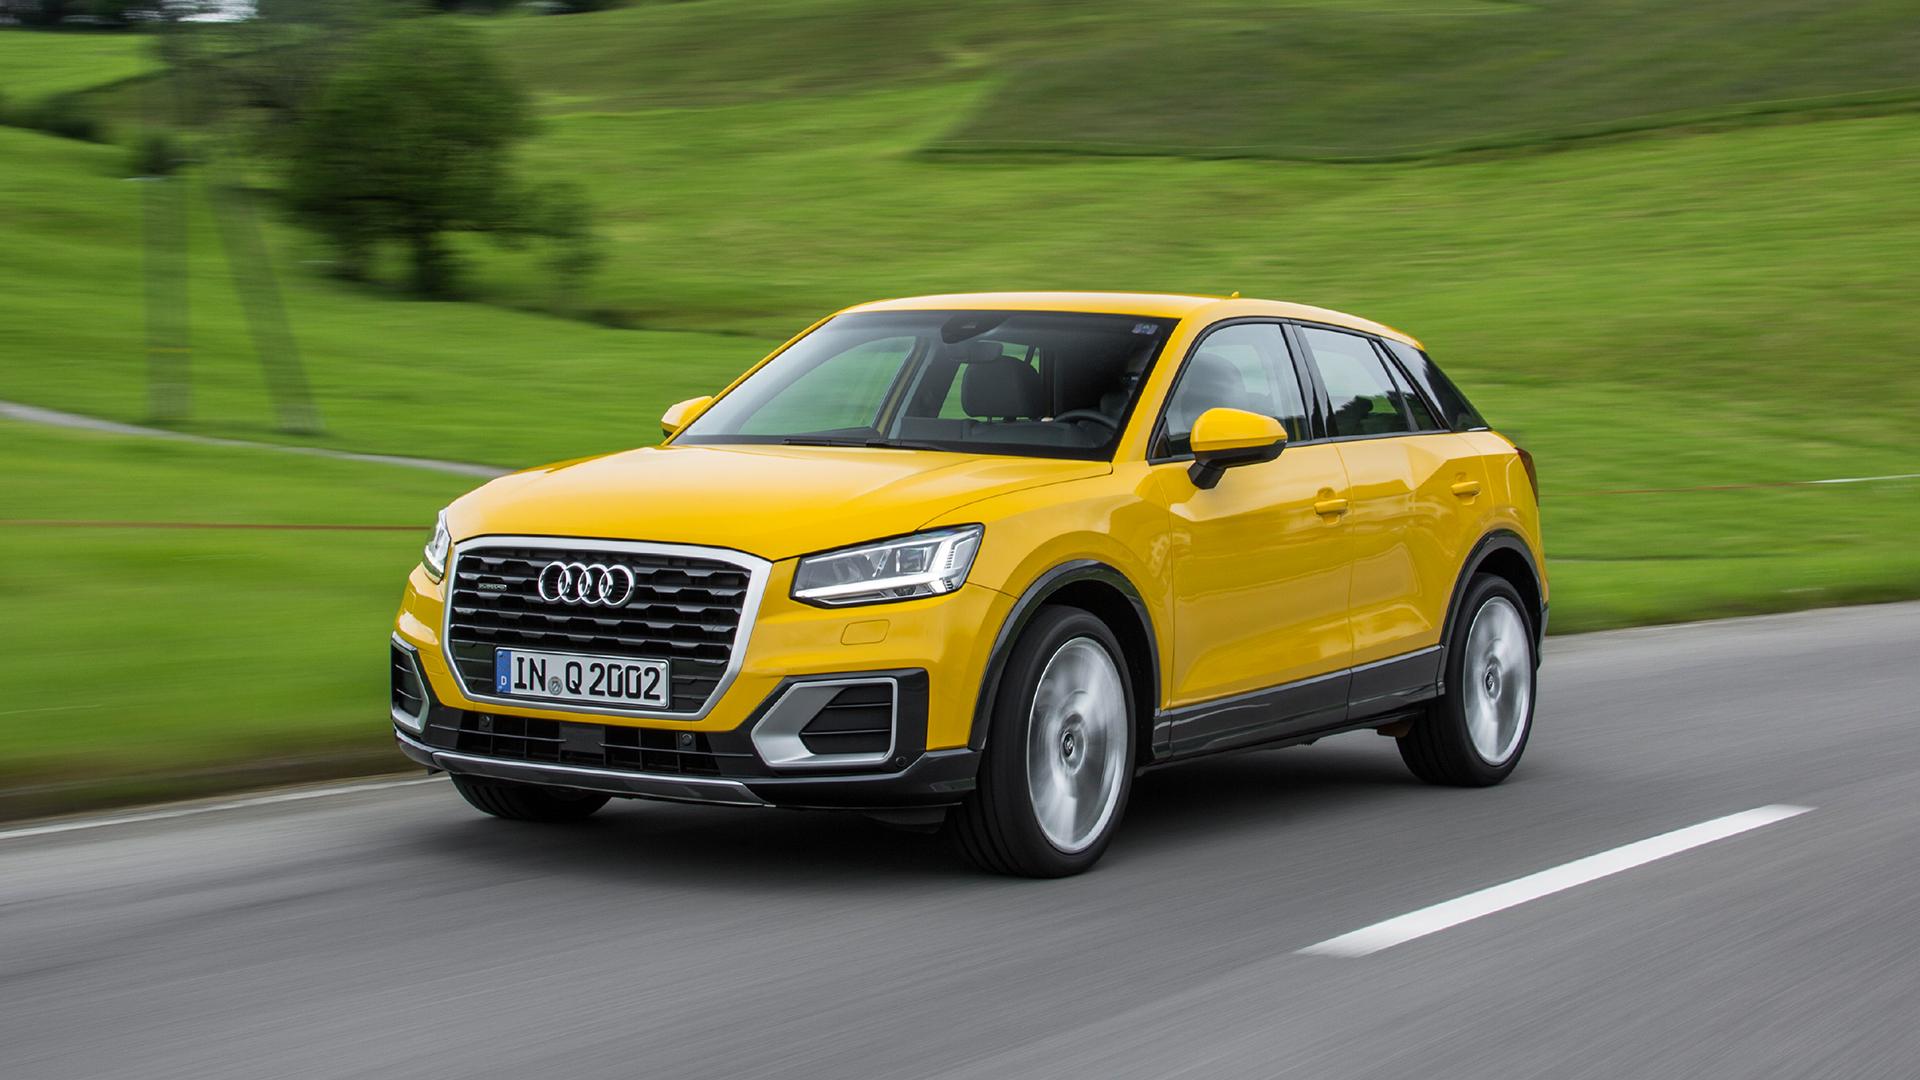 Audi Q2 2017 Price Mileage Reviews Specification